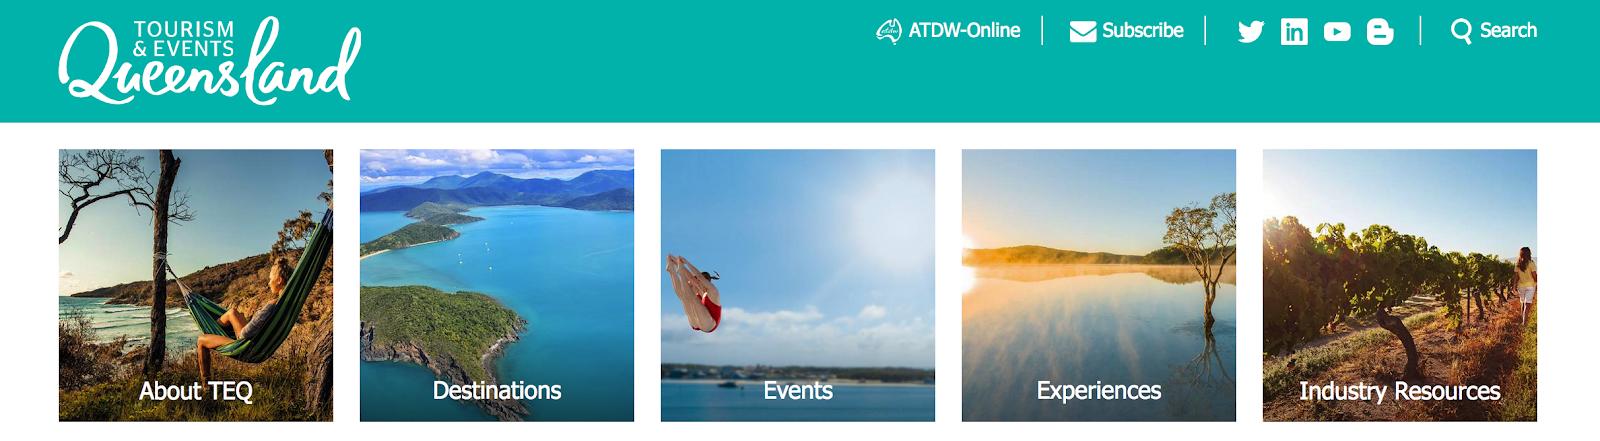 Travel Brands: Tourism & Events Queensland